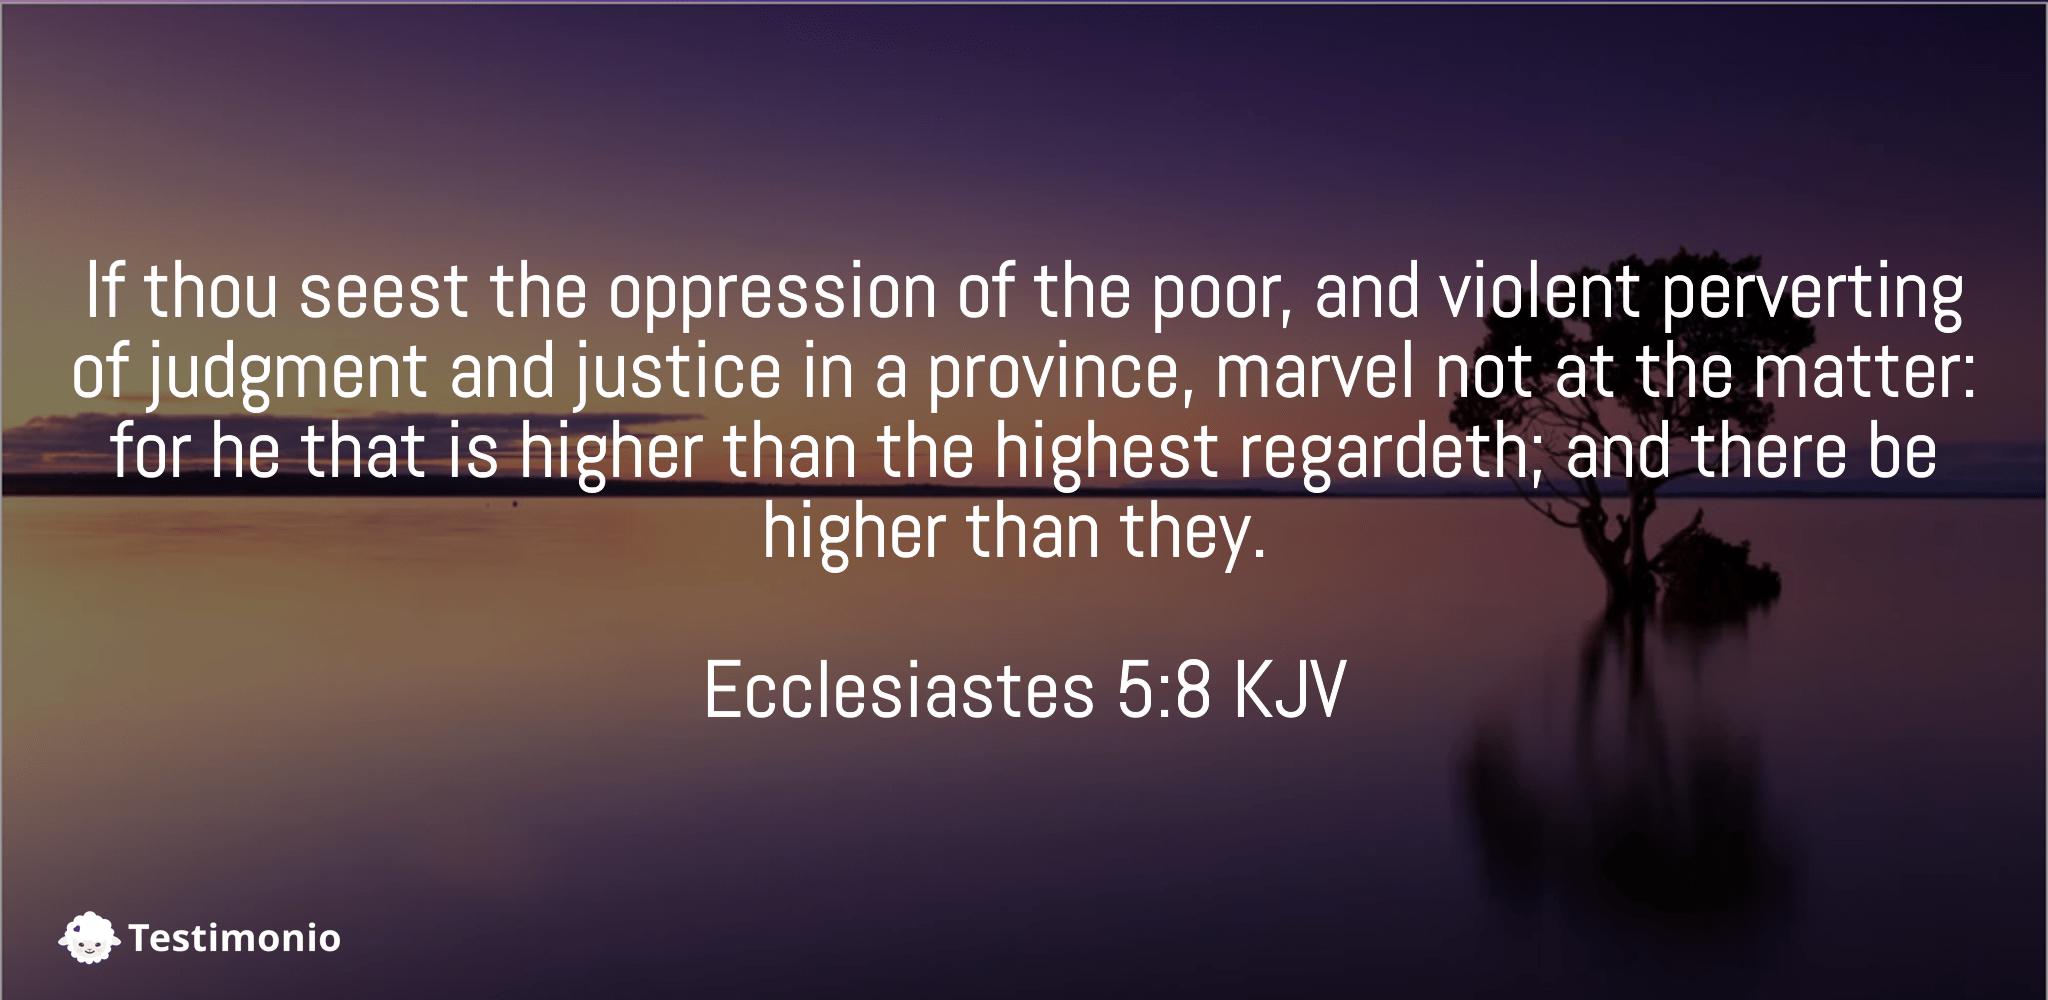 Ecclesiastes 5:8